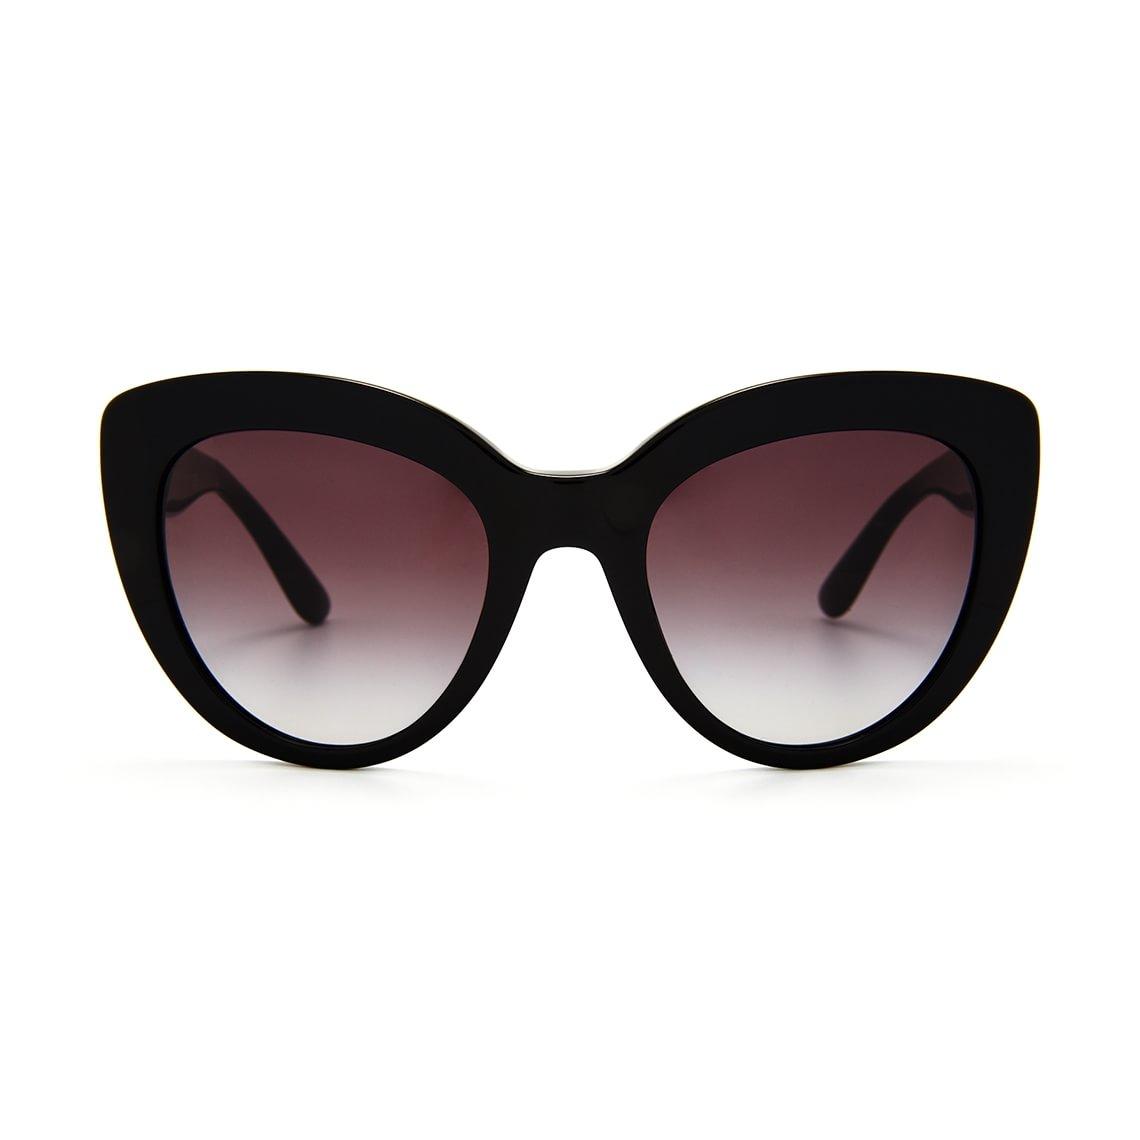 Dolce & Gabbana DG4287 501/8G 5321